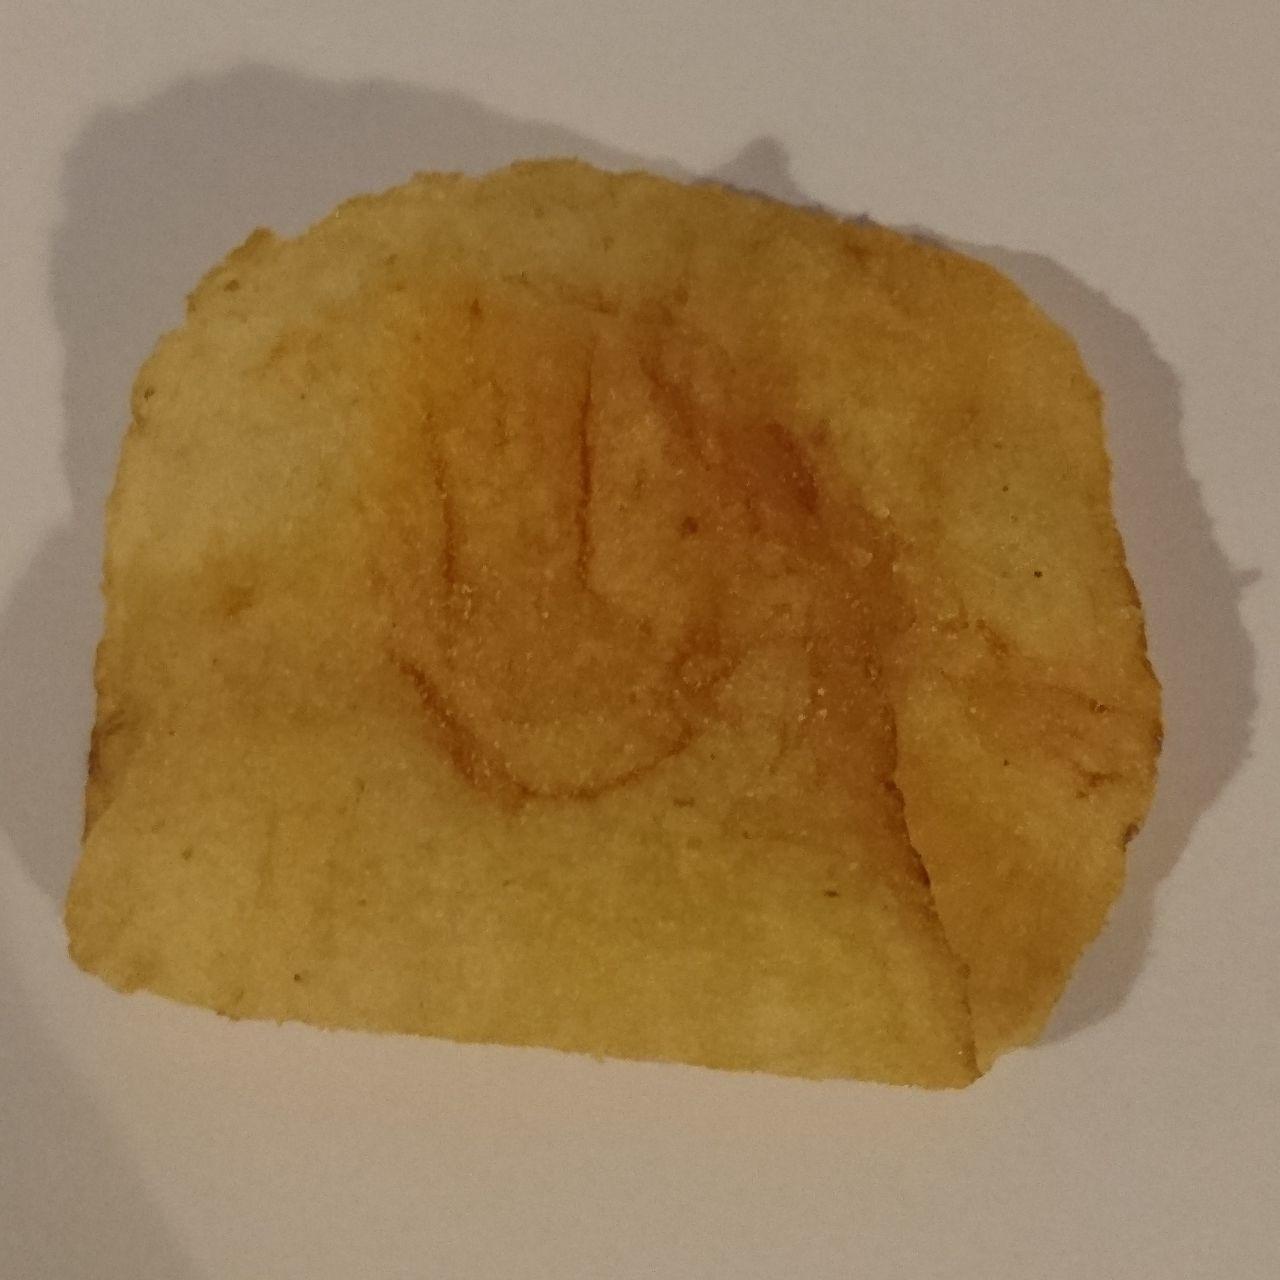 Ancient Close-up No People Day Crisps Crisp Crisp_captures Crispy Happy :) Happy Happy Crisp Crisp Face Face FaceShot